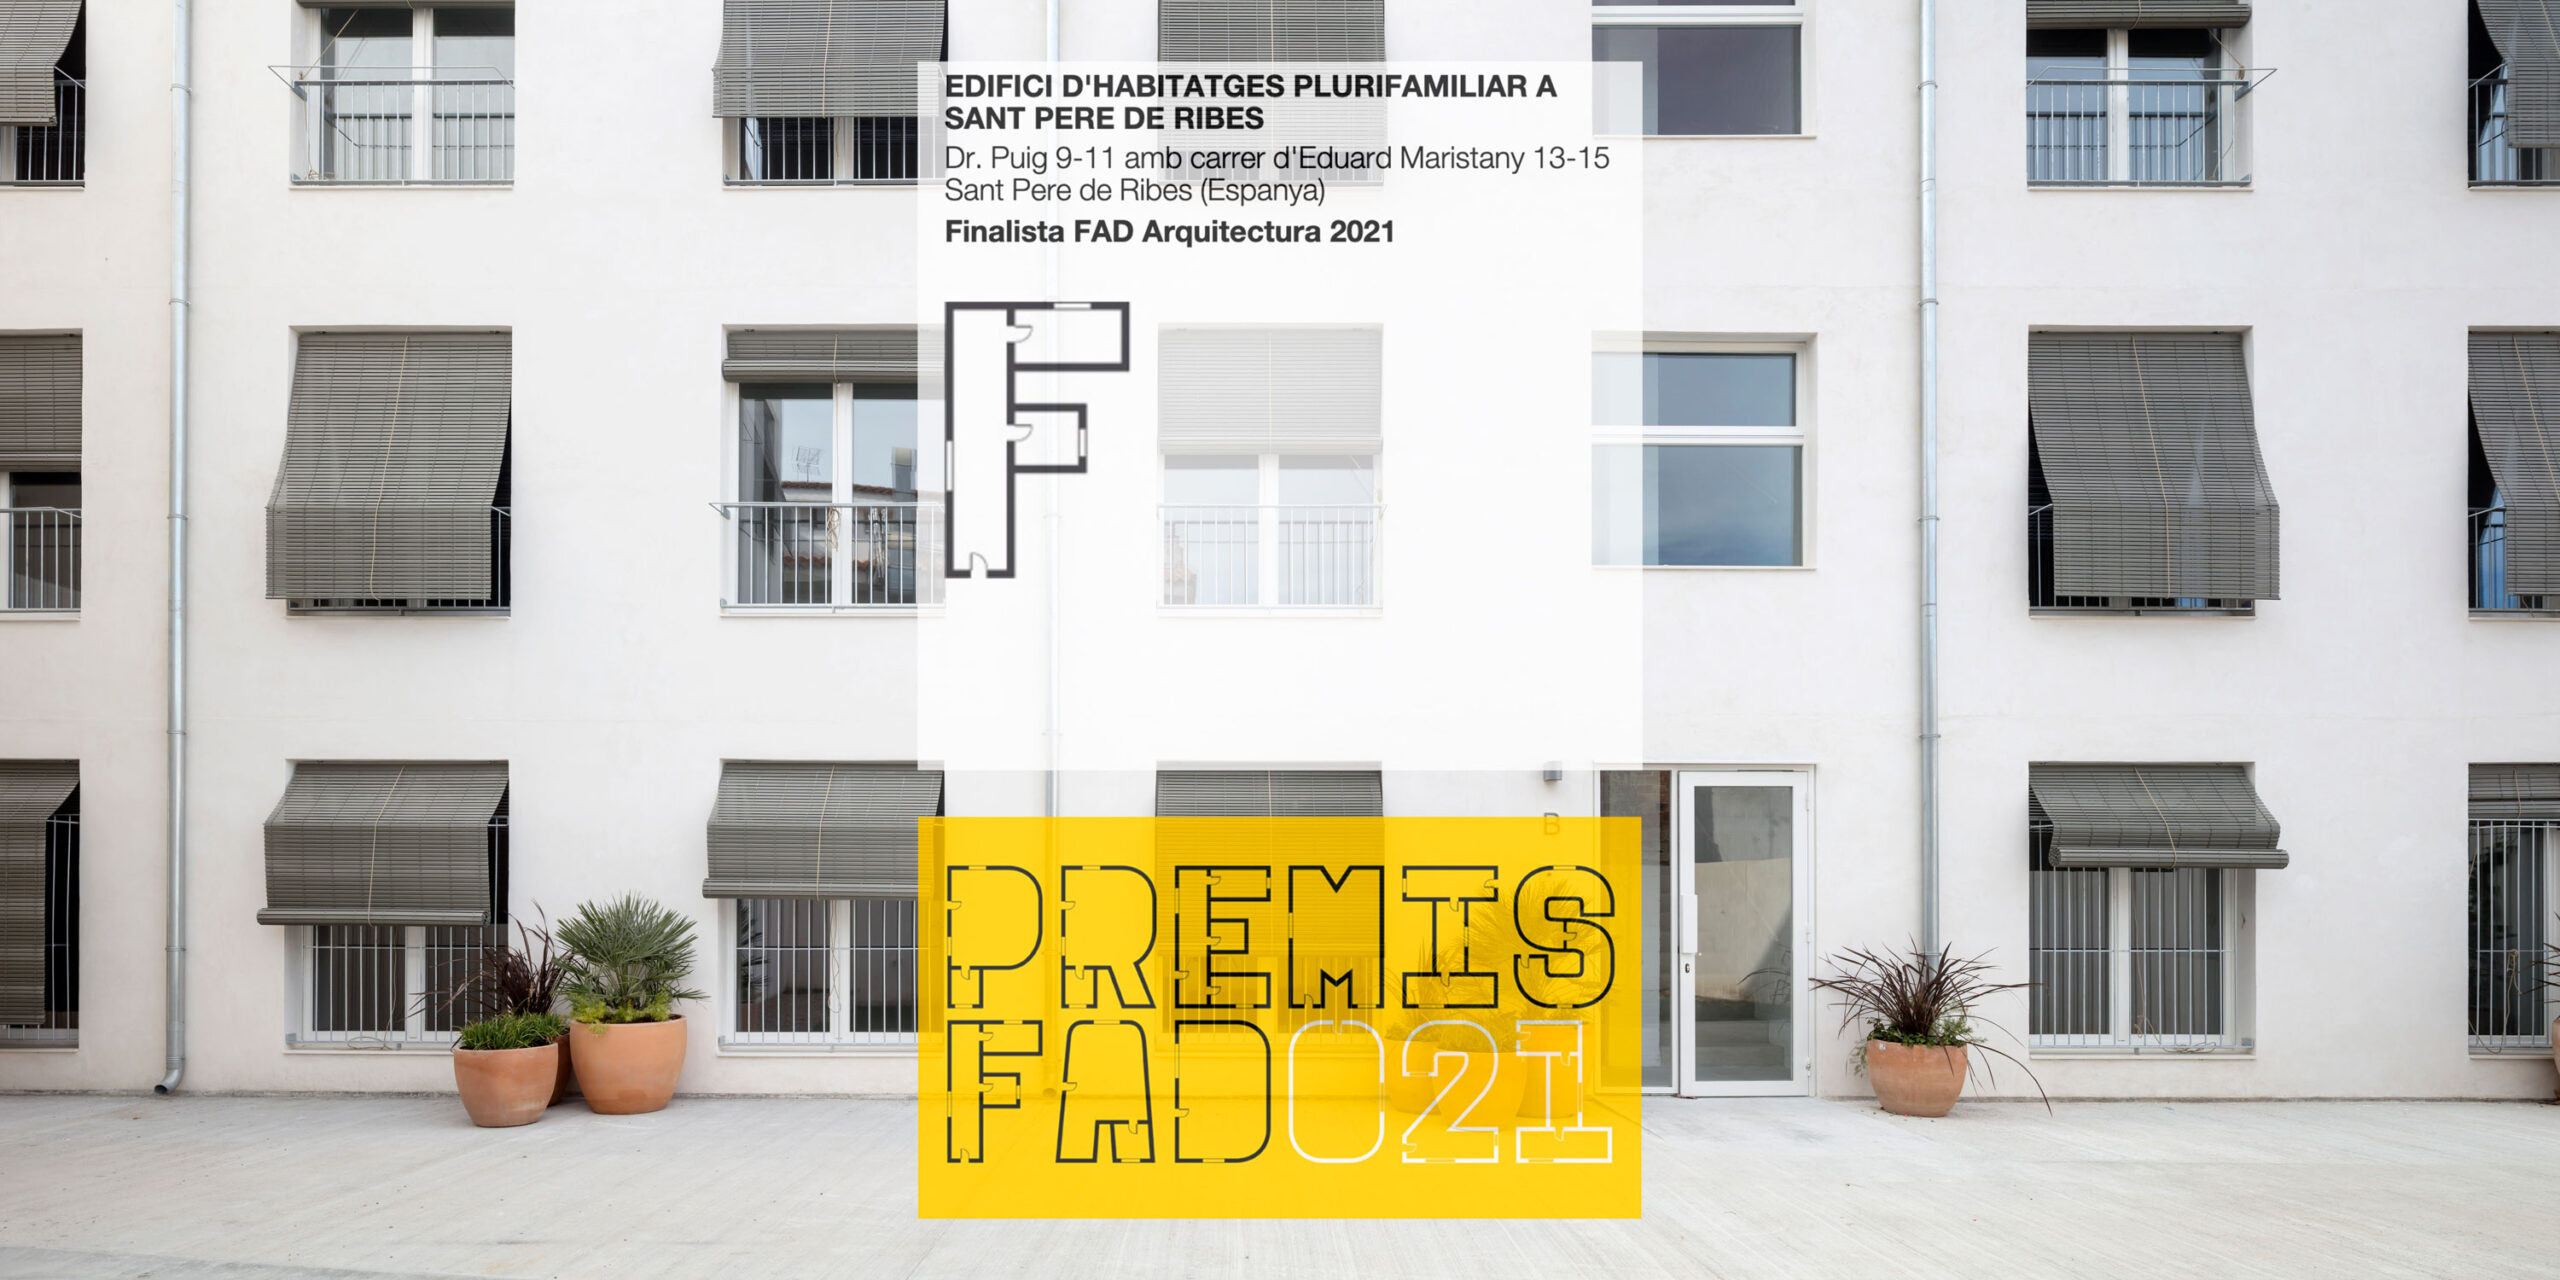 ELKE-Wood-Windows-Premis-FAD-DATAAE-SANT-PERE-DE-RIBES-insta-04